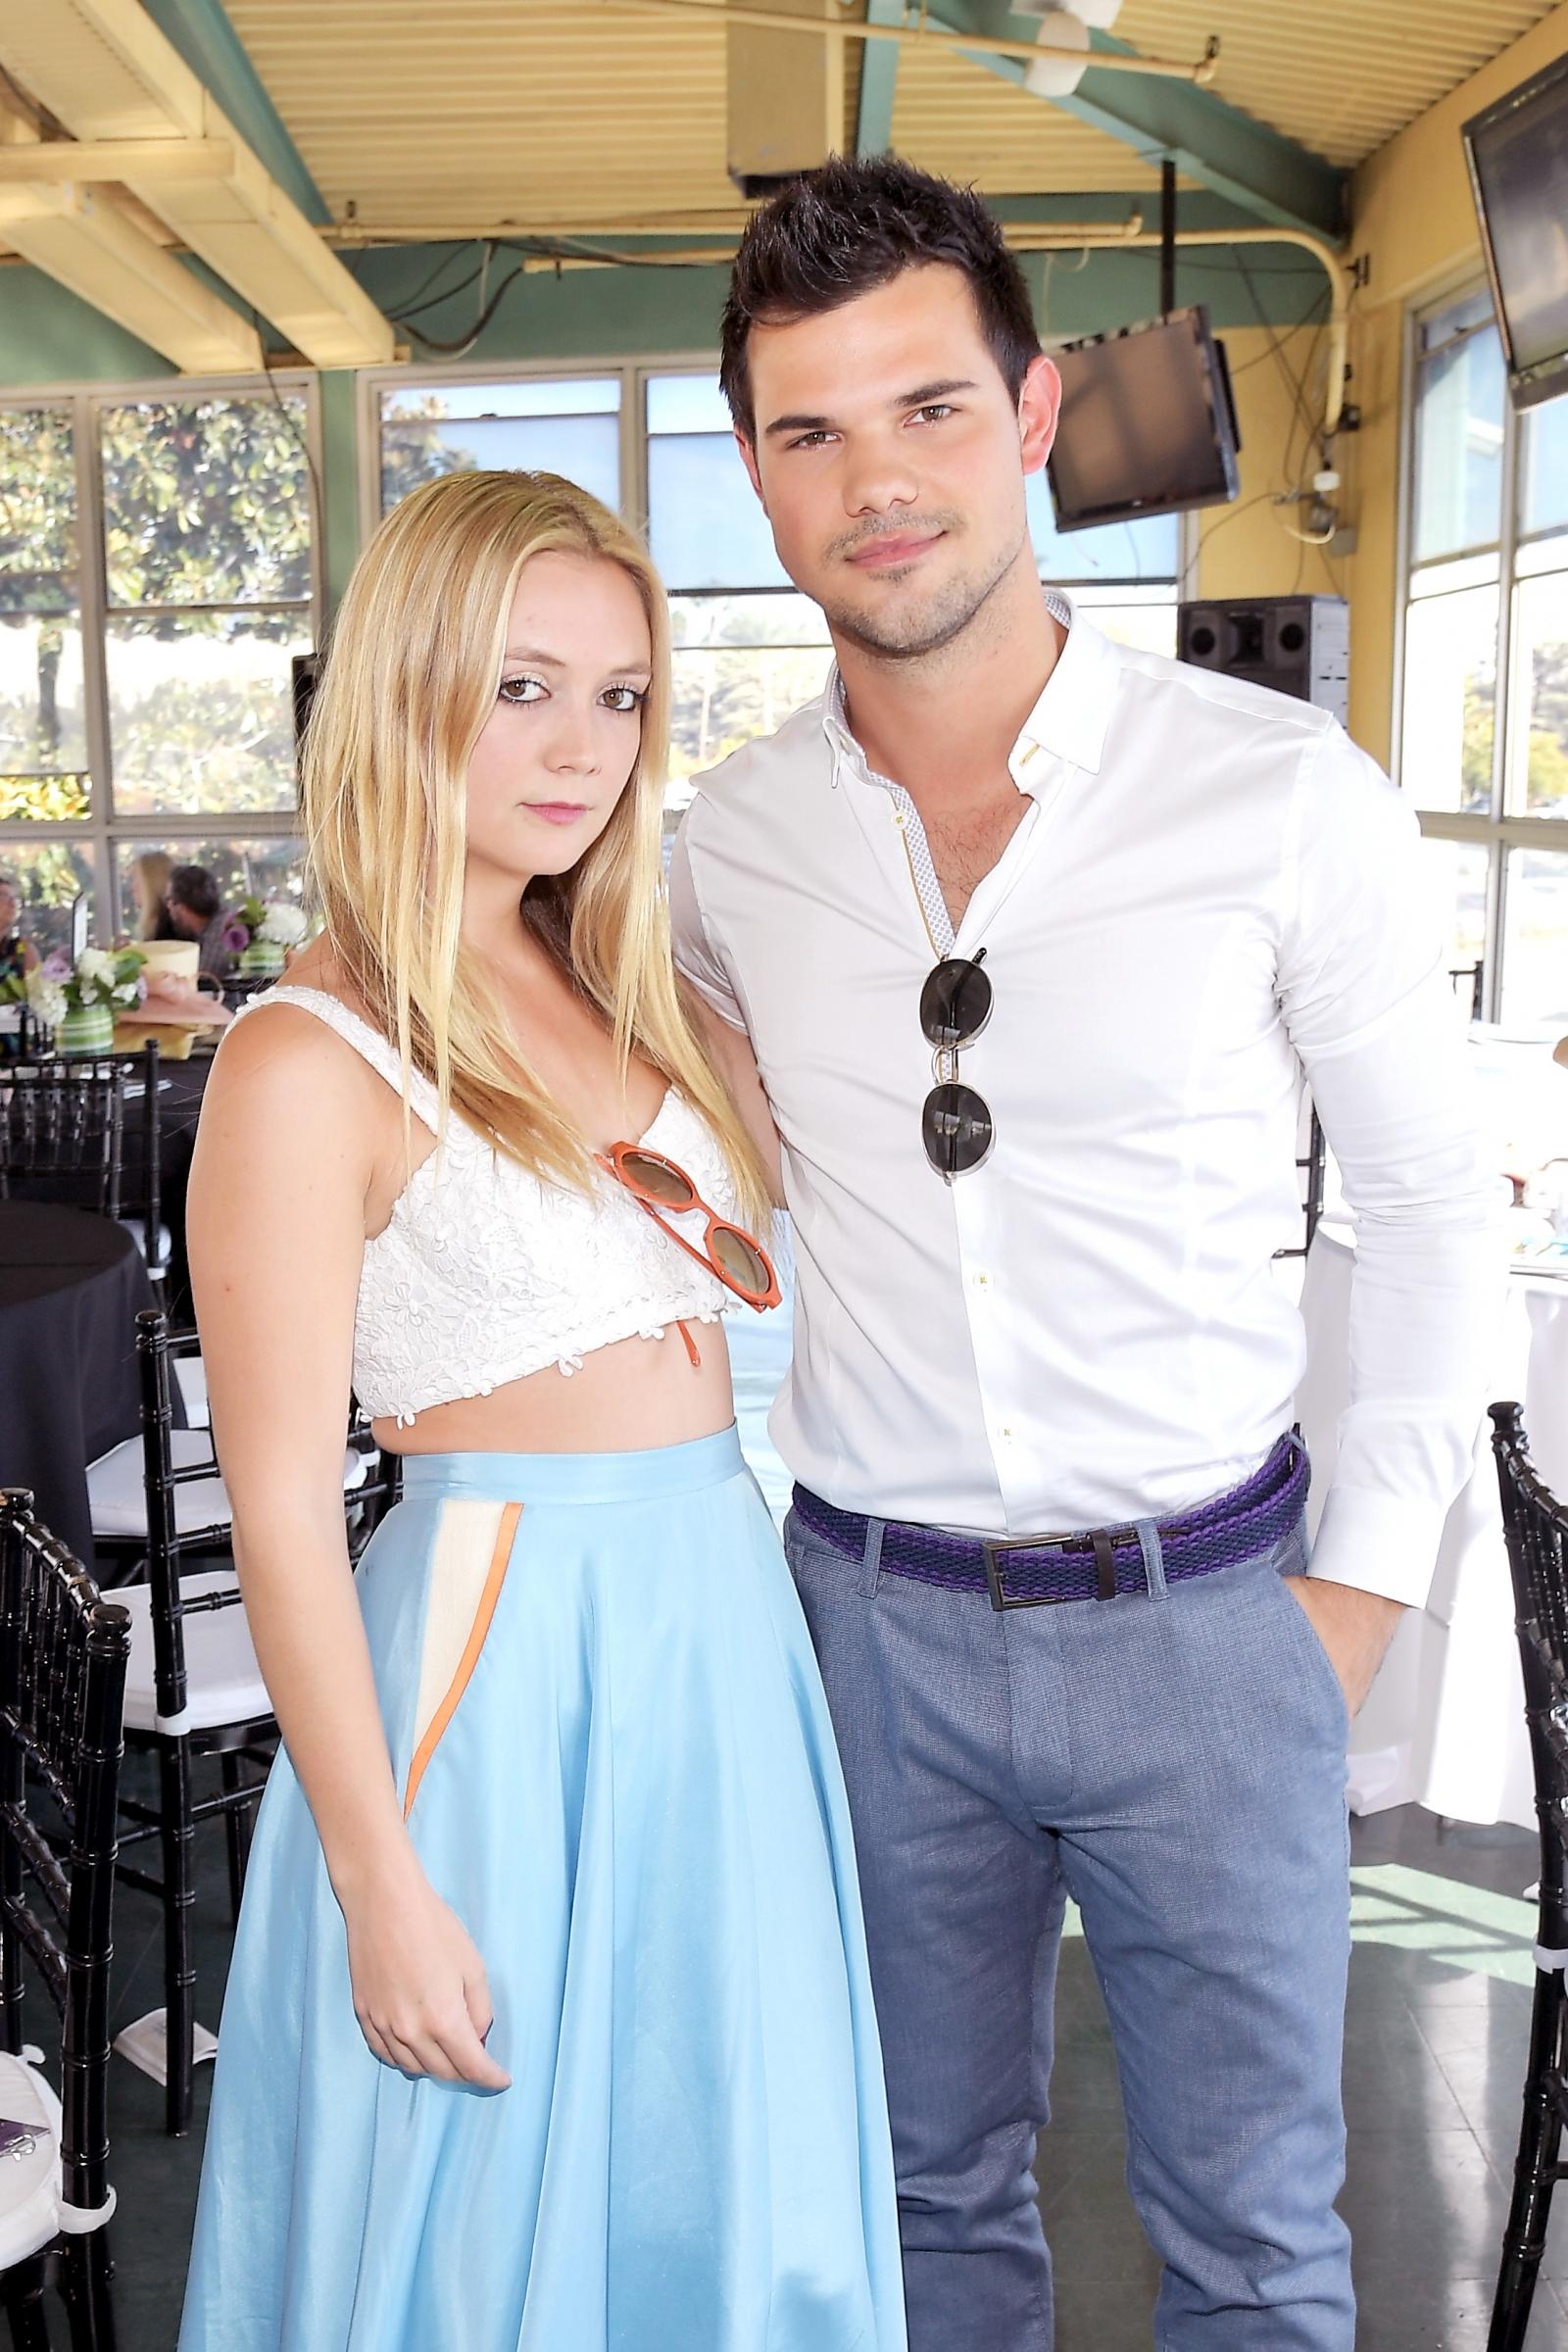 Billie Lourd and Taylor Lautner